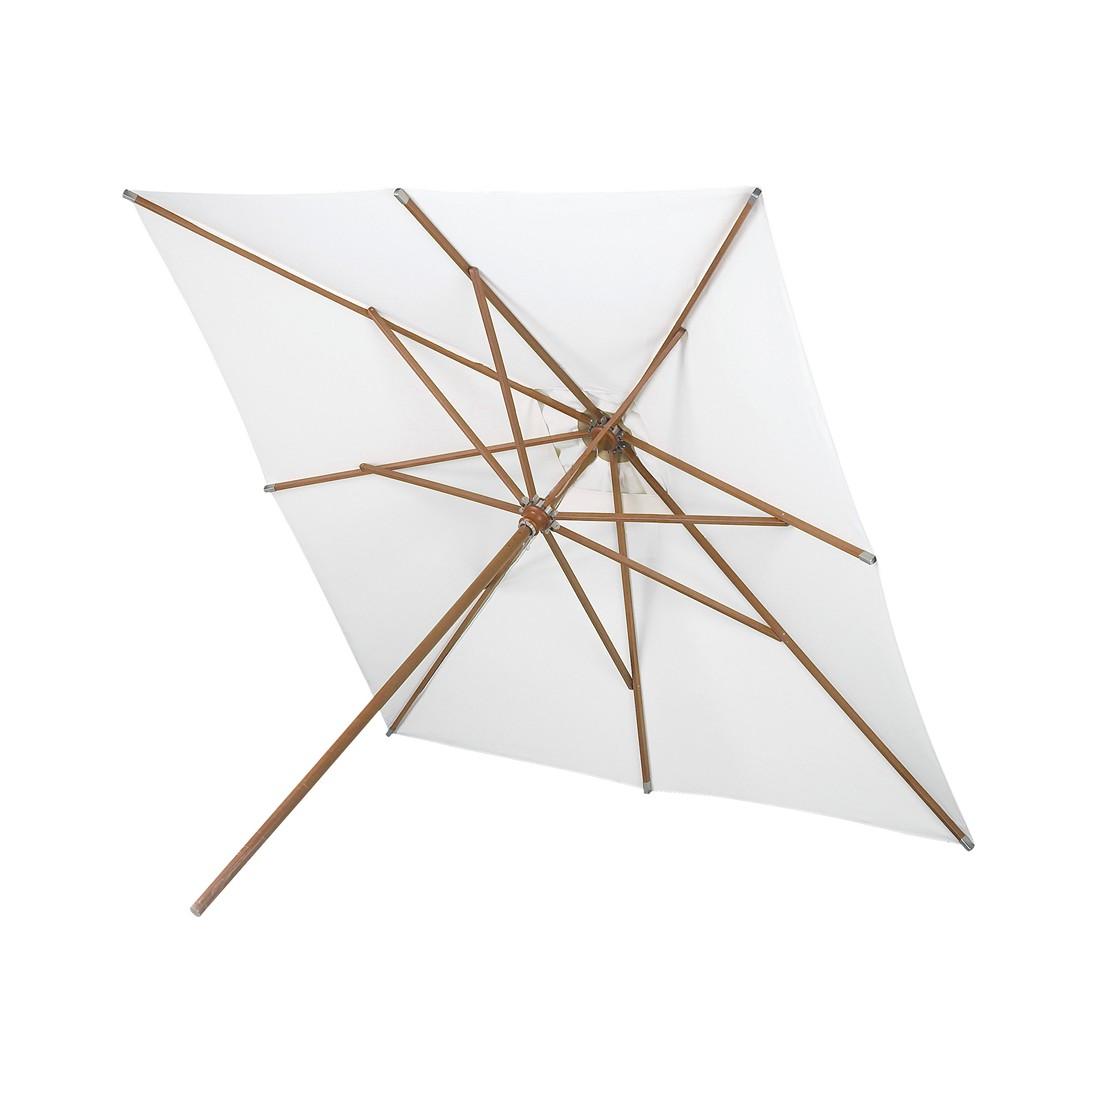 Sonnenschirm Messina Holz quadratisch - Meranti-Holz Naturweiß, Skagerak